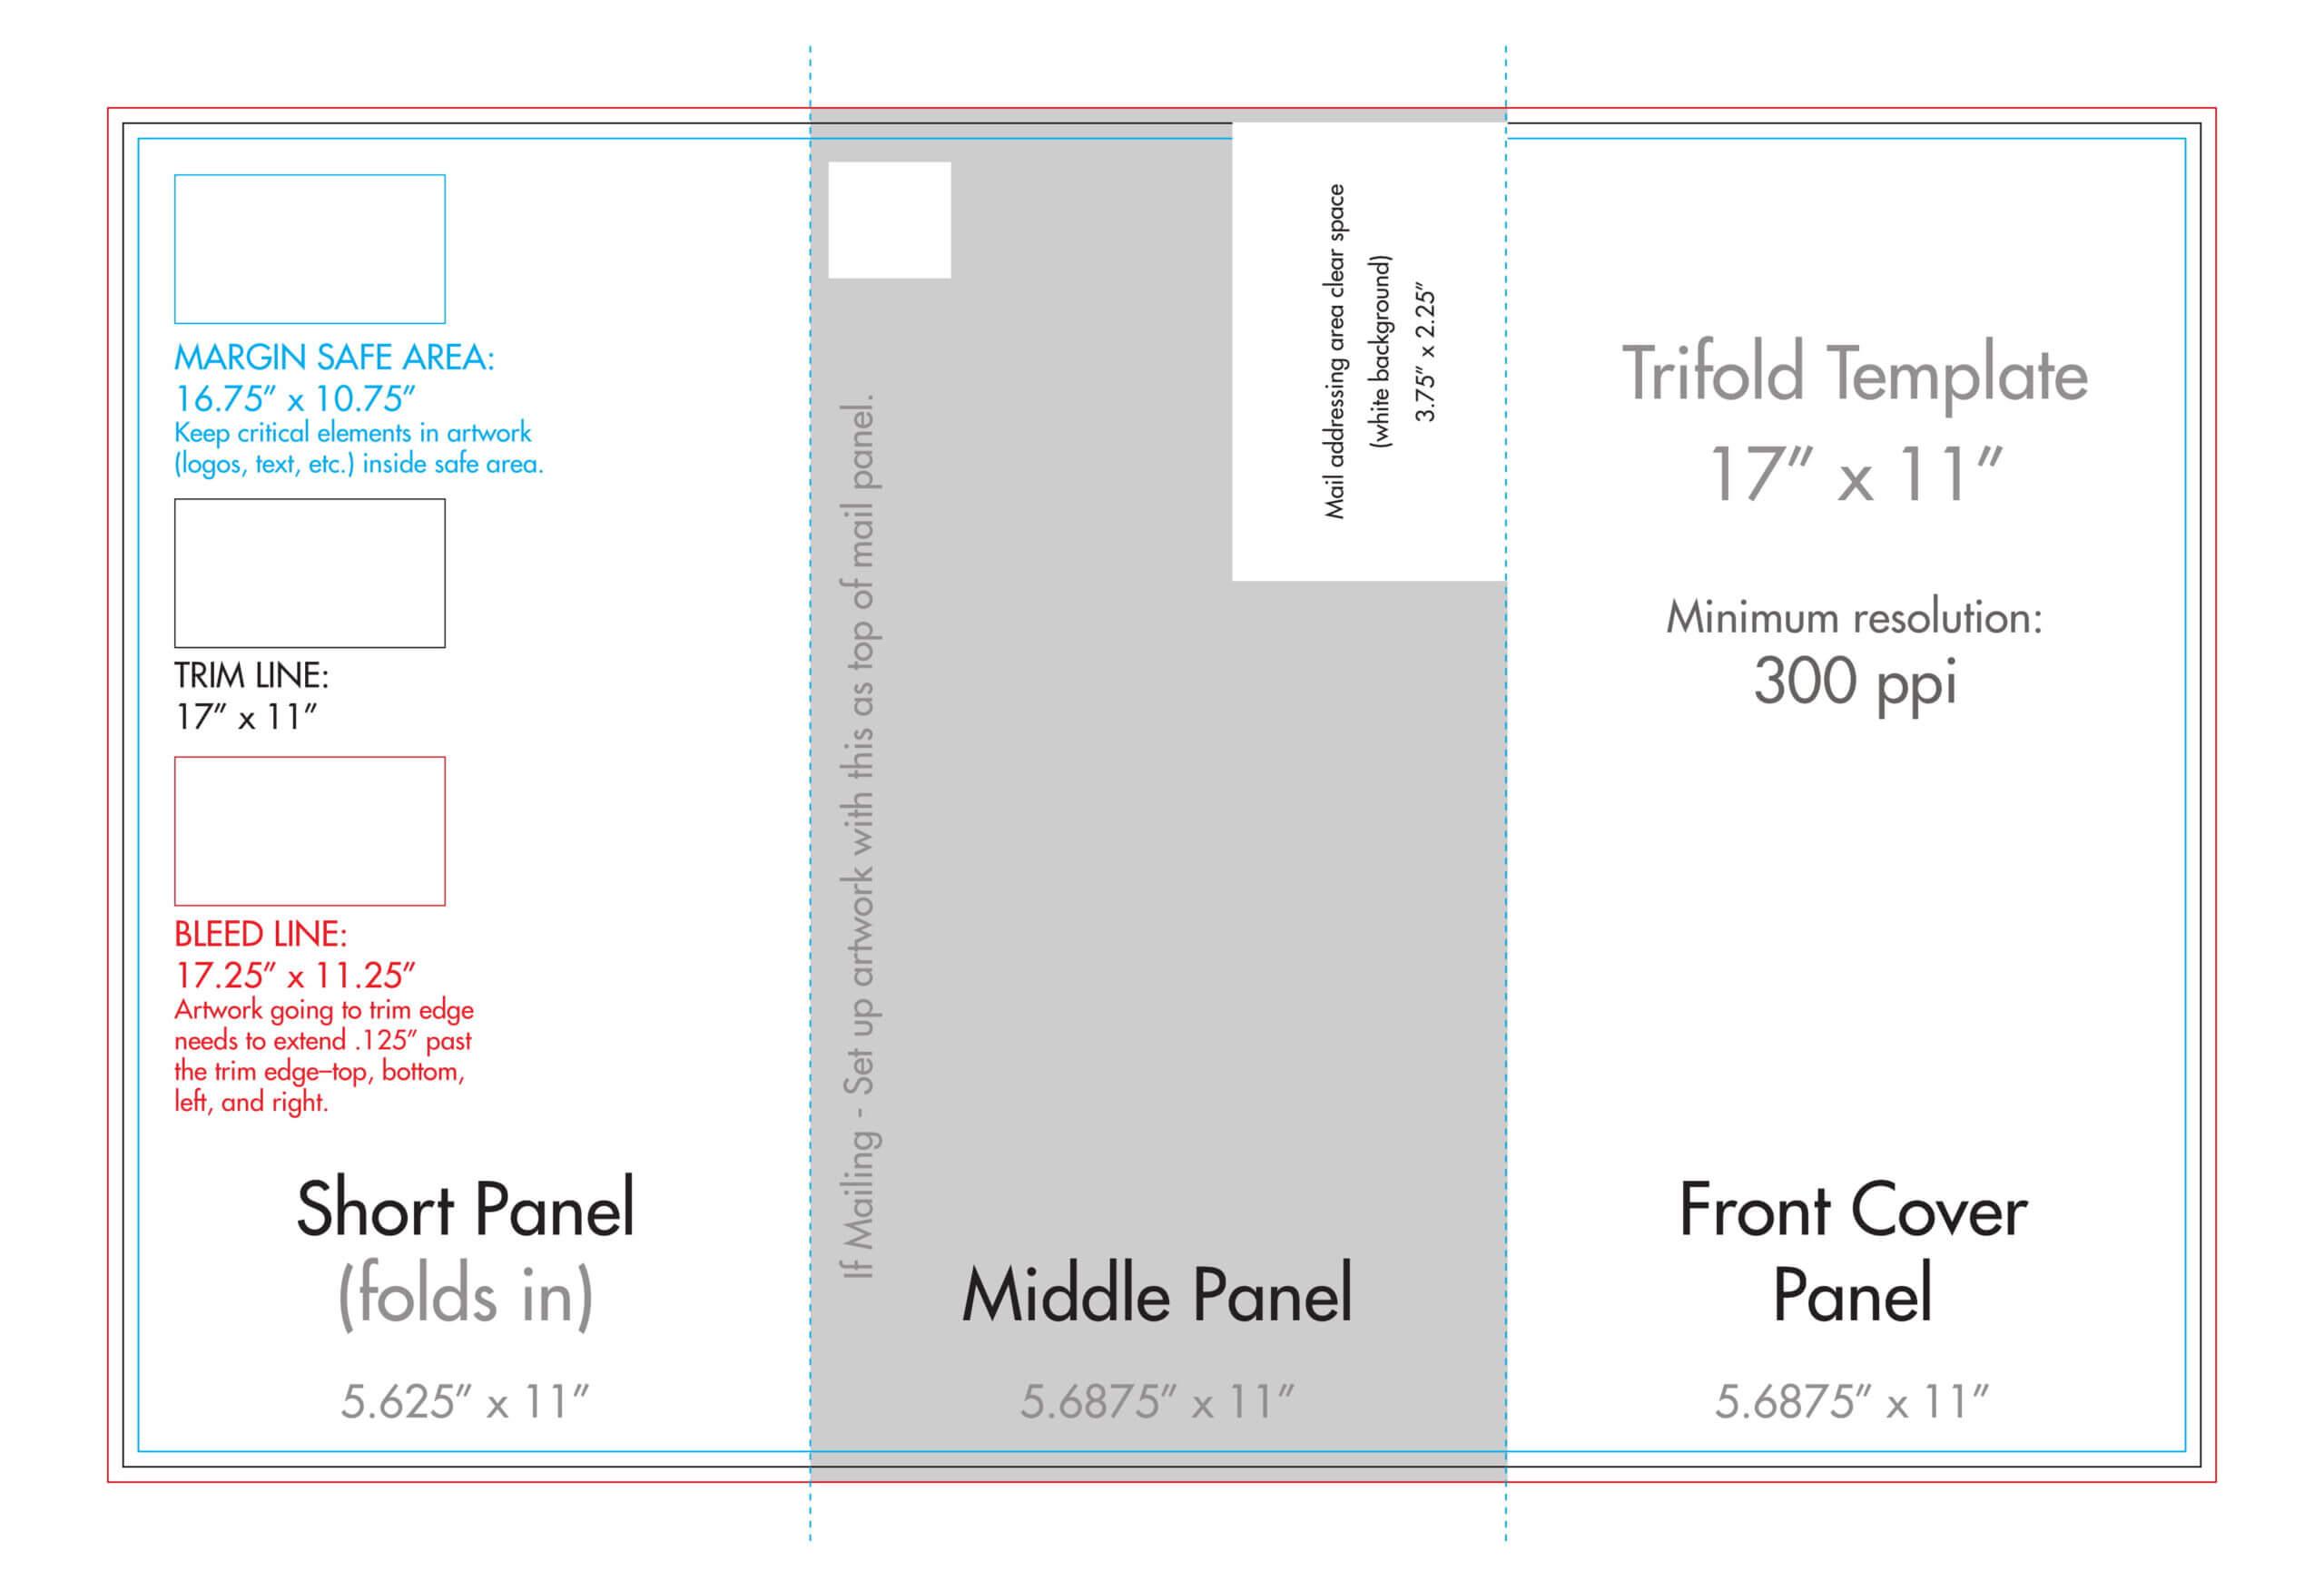 007 Template Ideas Trifold 11X17 Tri Fold Brochure With Regard To 11X17 Brochure Template